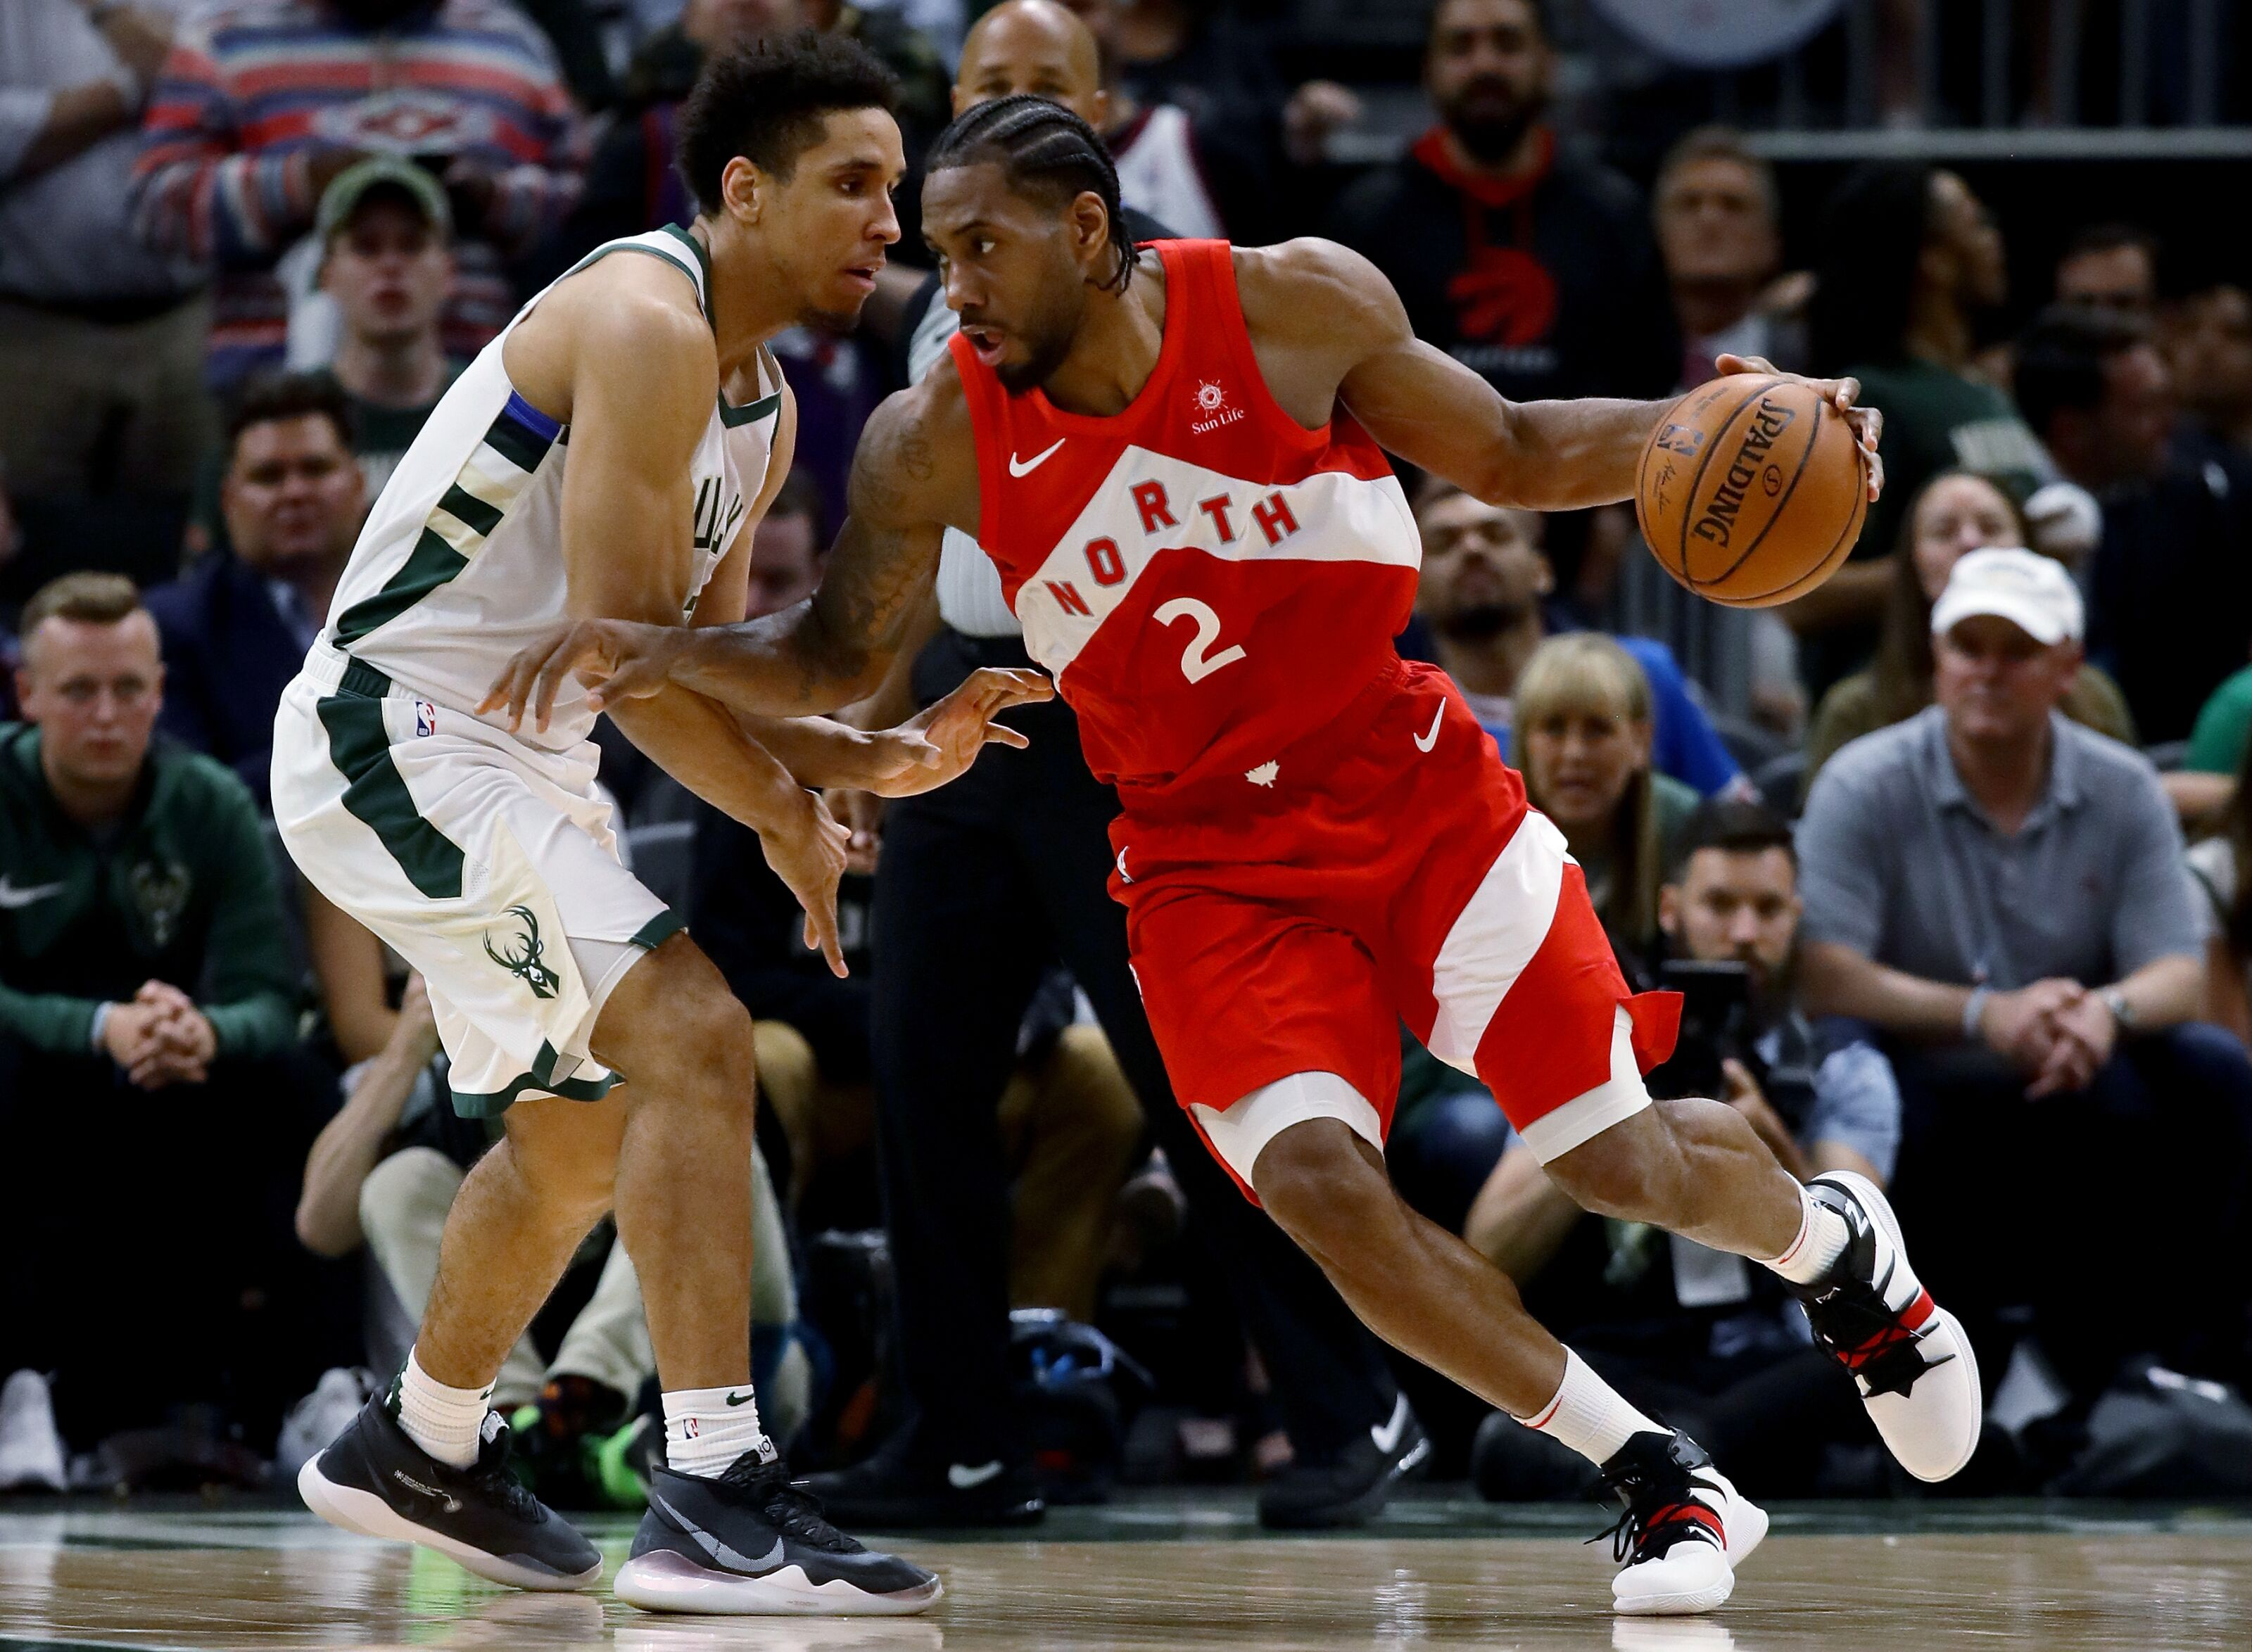 bea1de8f42c Toronto Raptors should be ready to achieve historic win in Game 6